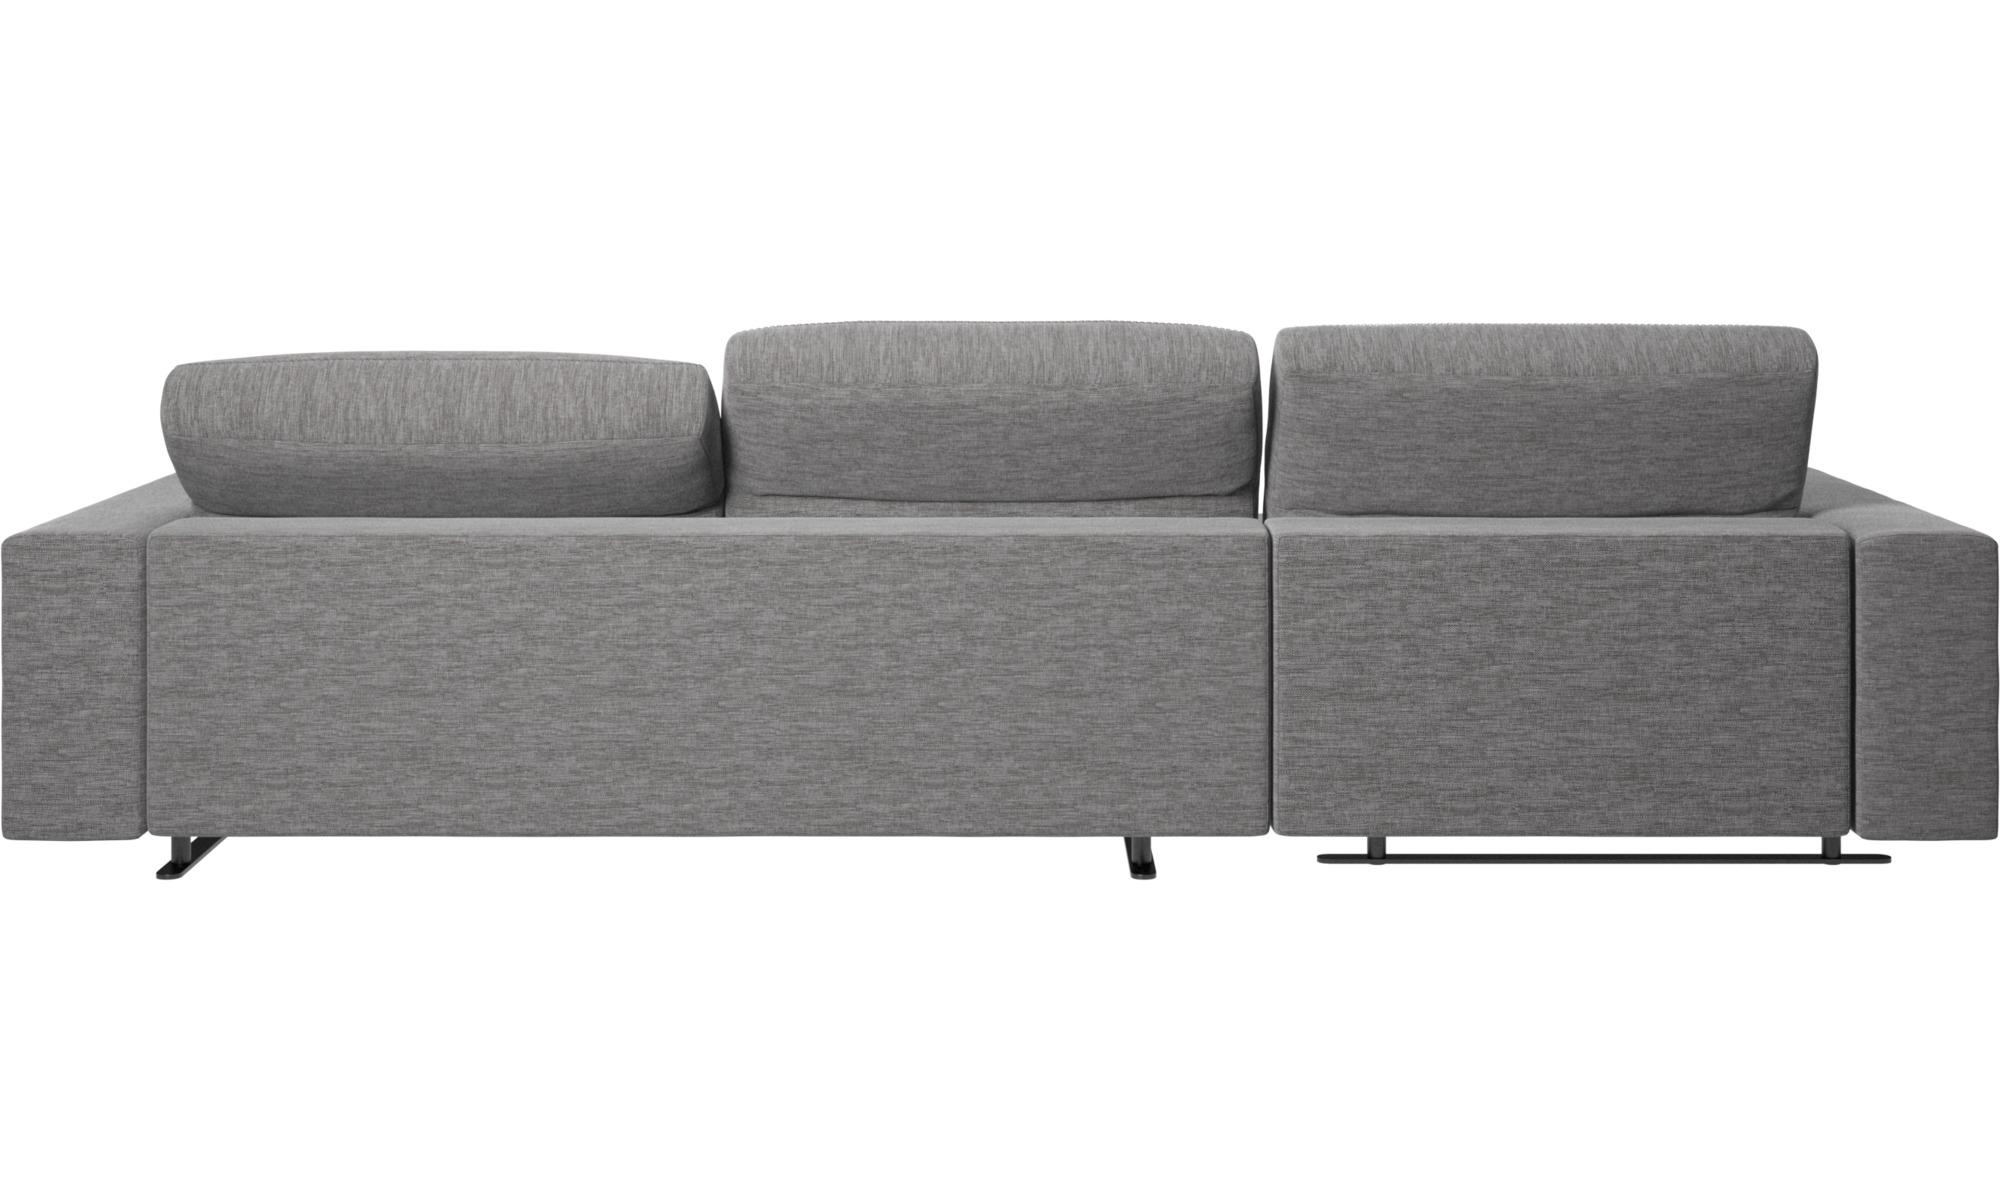 Chaise Lounge Sofas Hampton Sofa With Adjustable Back Resting